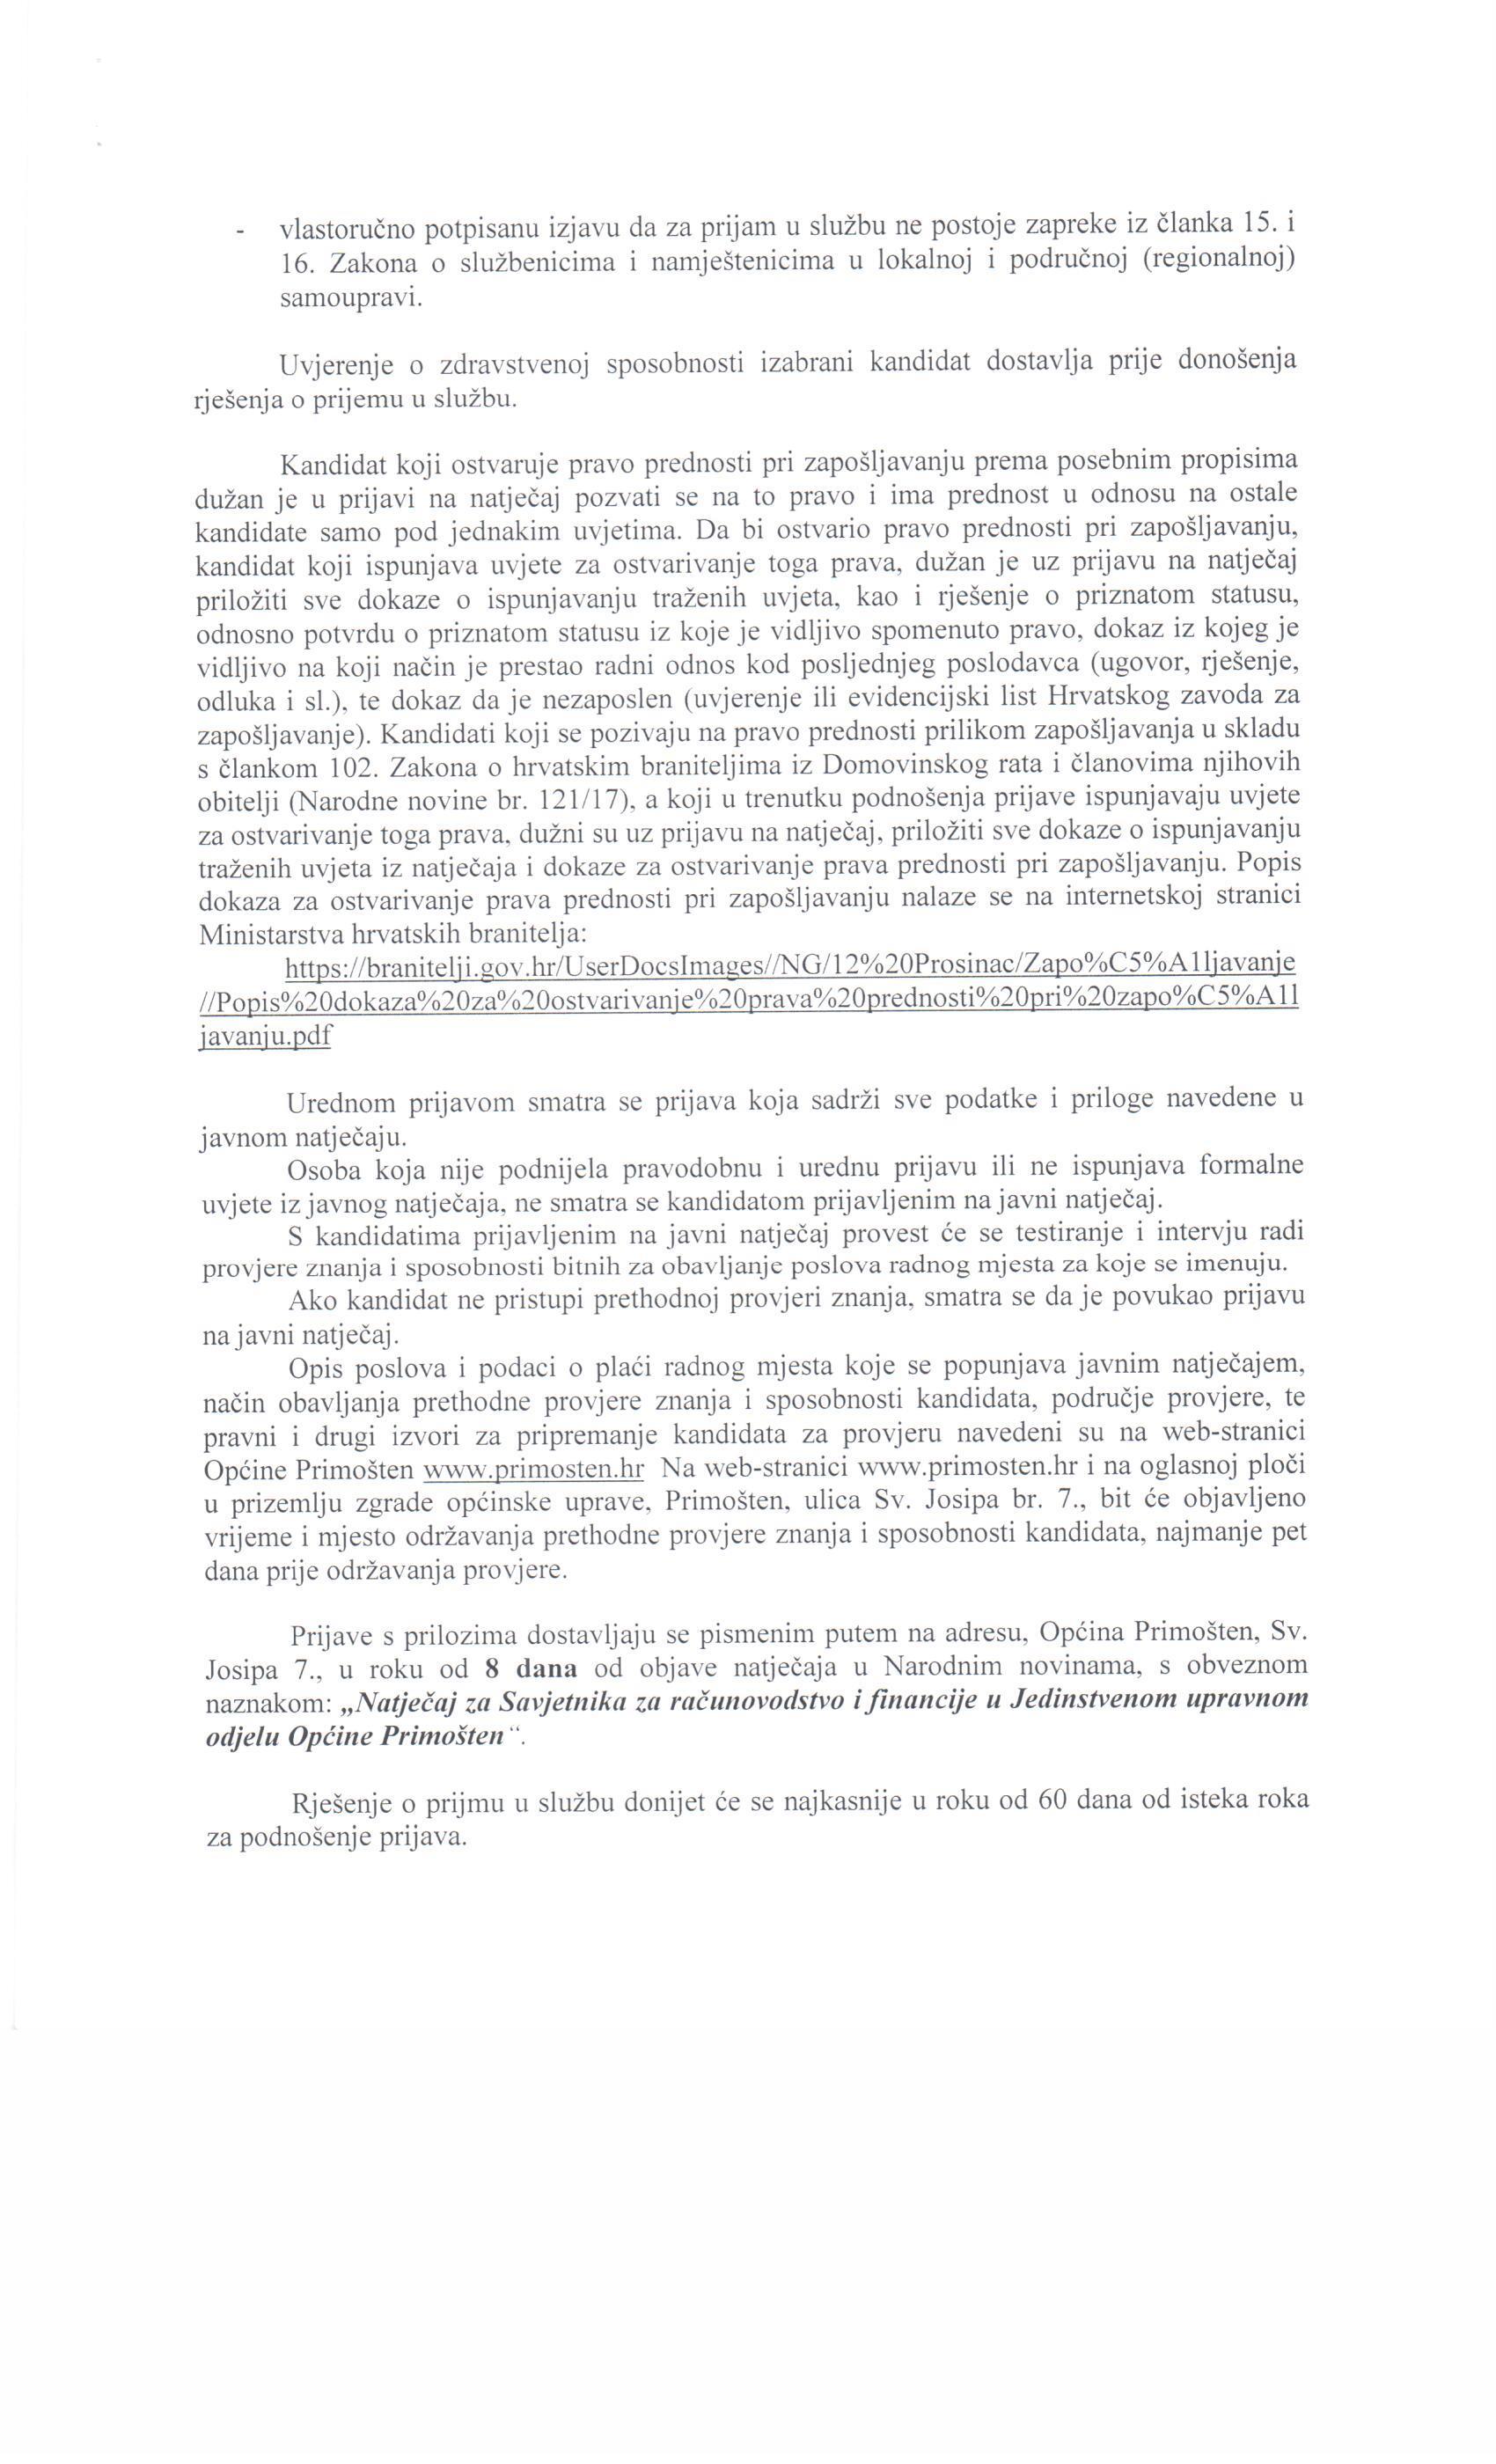 savjetnik_za_racunovodstvo0002